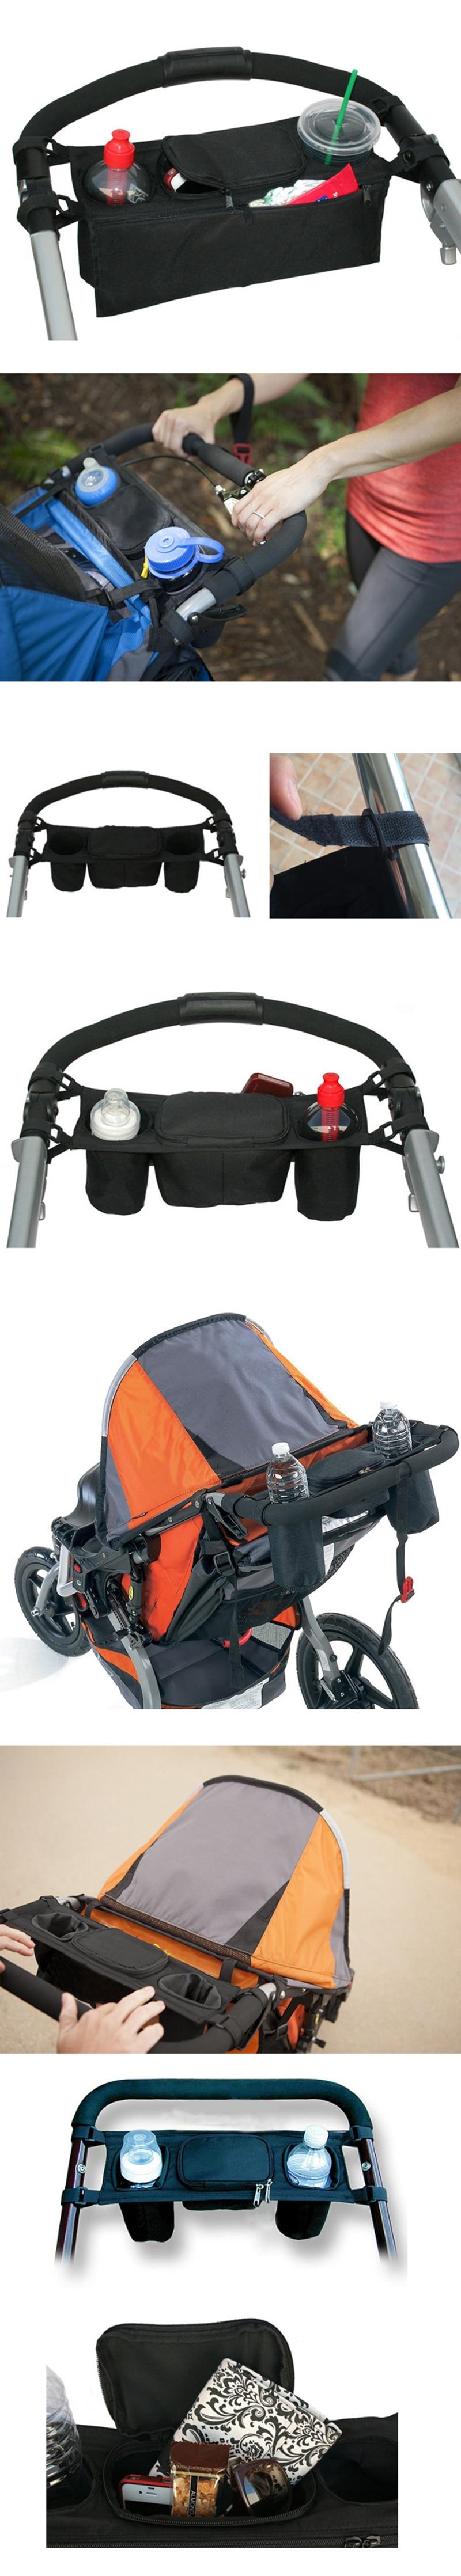 HTB1wSsknmfD8KJjSszhq6zIJFXal Baby Stroller Bag Infant Nappy Bags Outdoor Carriage Hanging Bottle Storage Wheelchair Organizer Portable Maternity Bolsa T0507